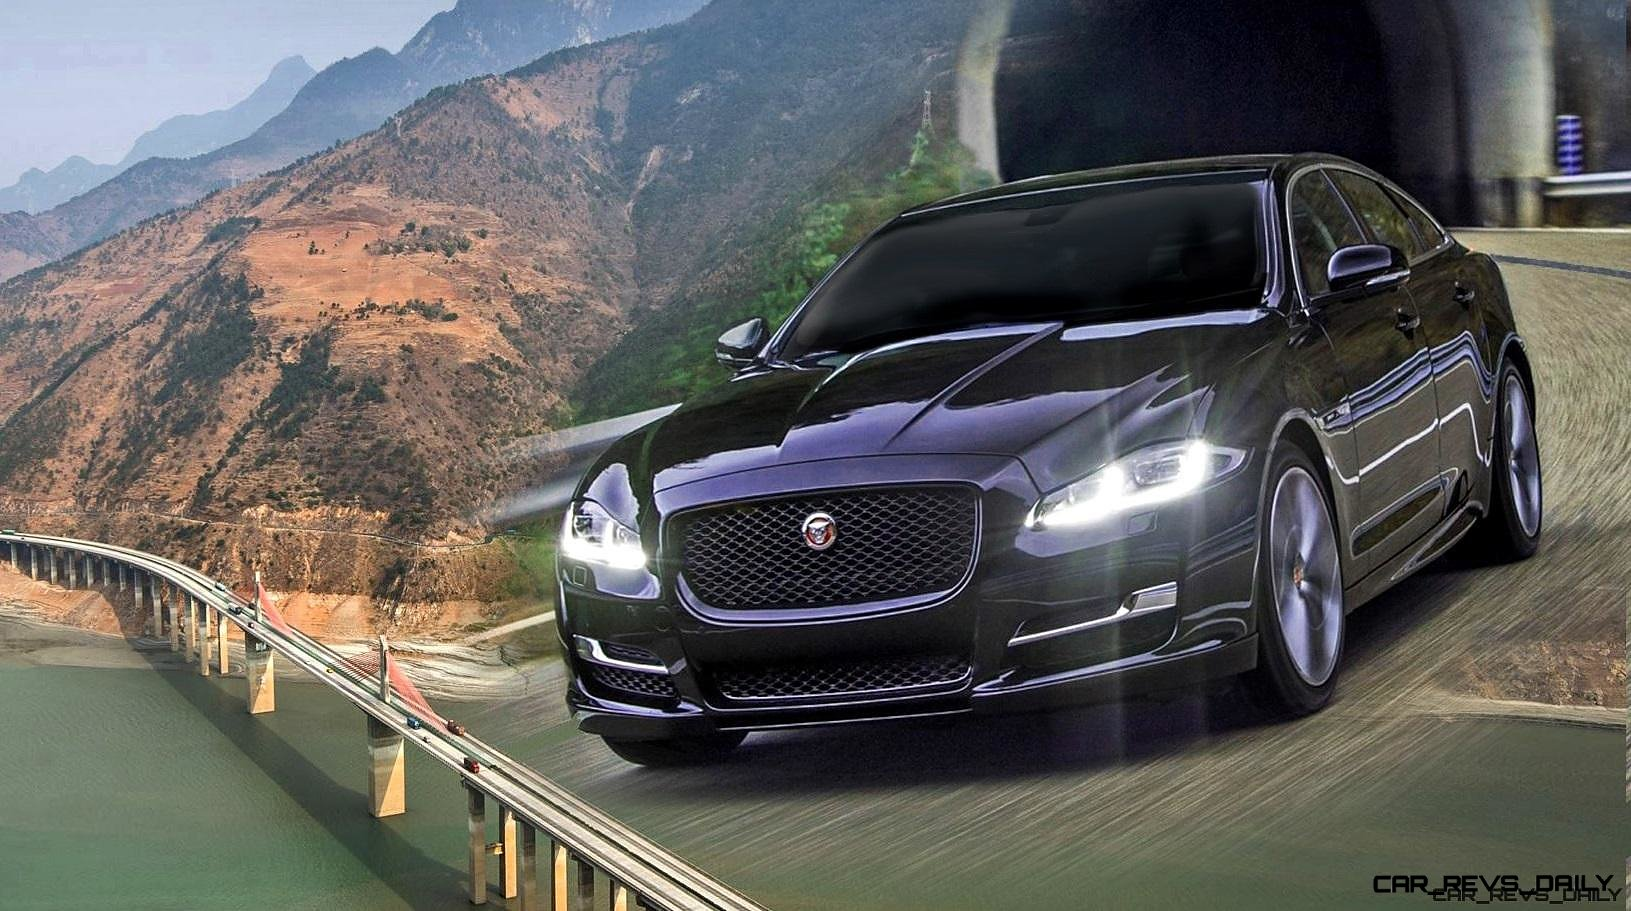 All Types 2016 xj : 2016 Jaguar XJ Carves $3B China Skyroad in Plush, Superlux Fashion!